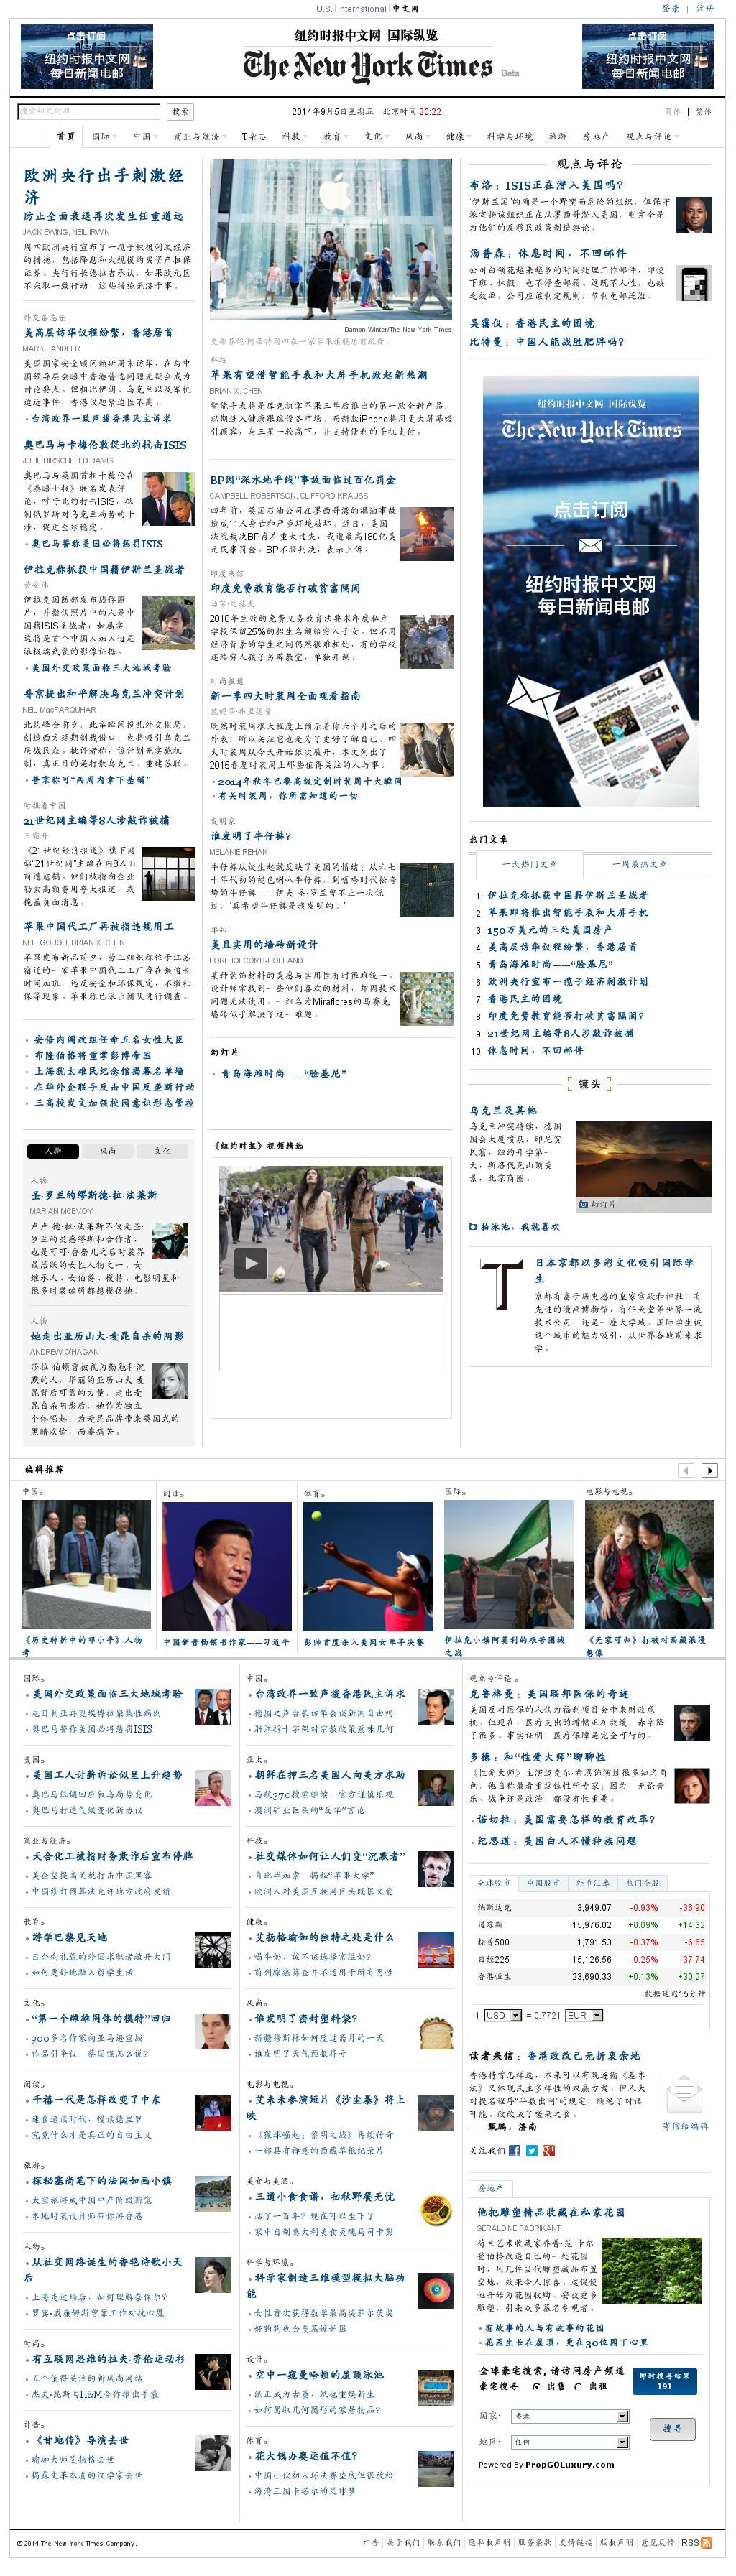 The New York Times (Chinese) at Saturday Sept. 6, 2014, 2:10 p.m. UTC